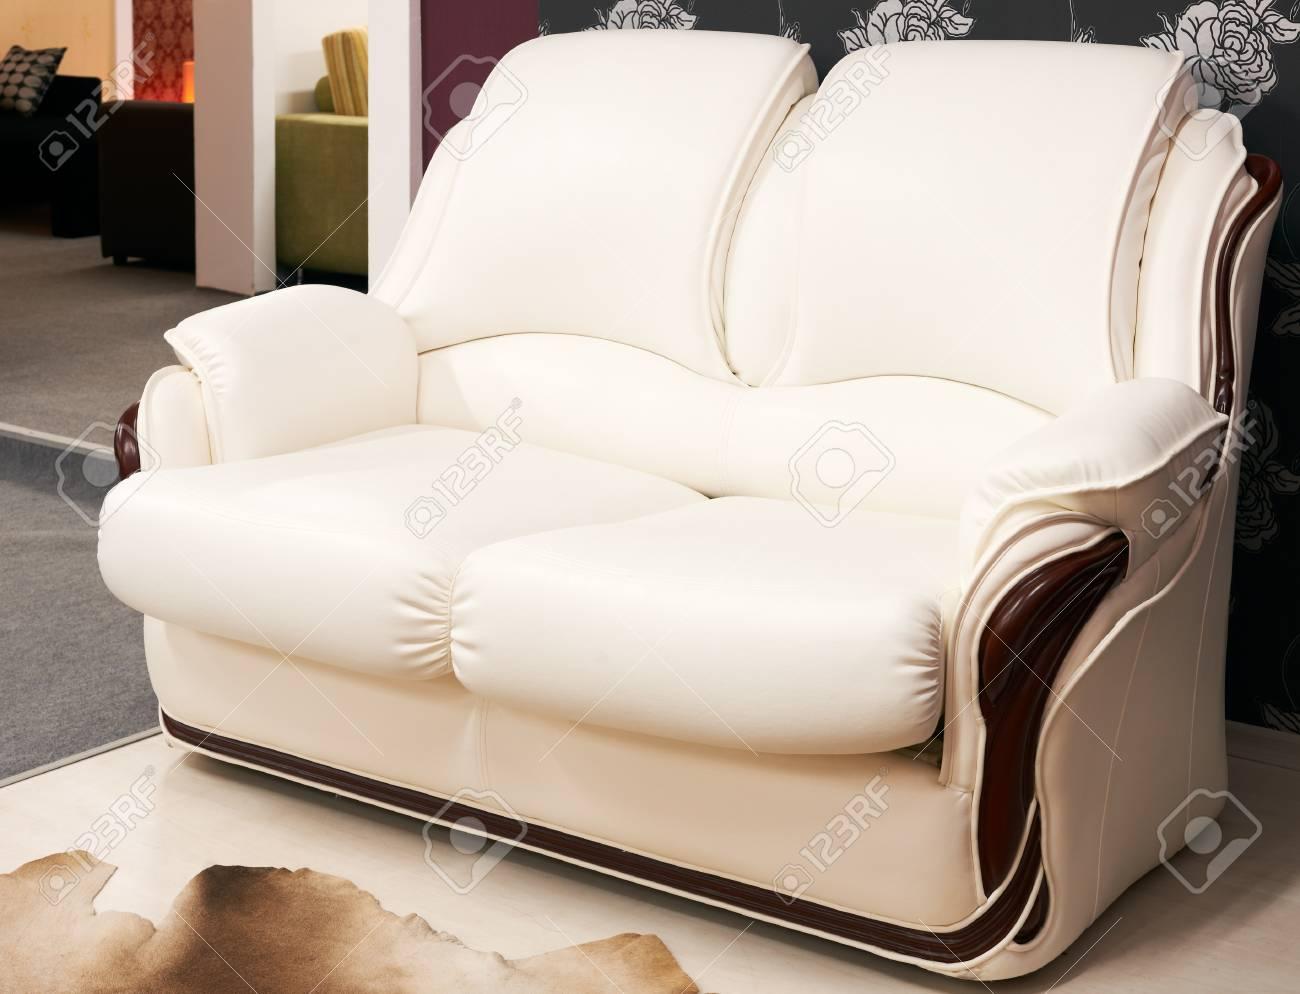 Doppel Sessel Modernen Marktführer Bedeckten Möbeln Lizenzfreie